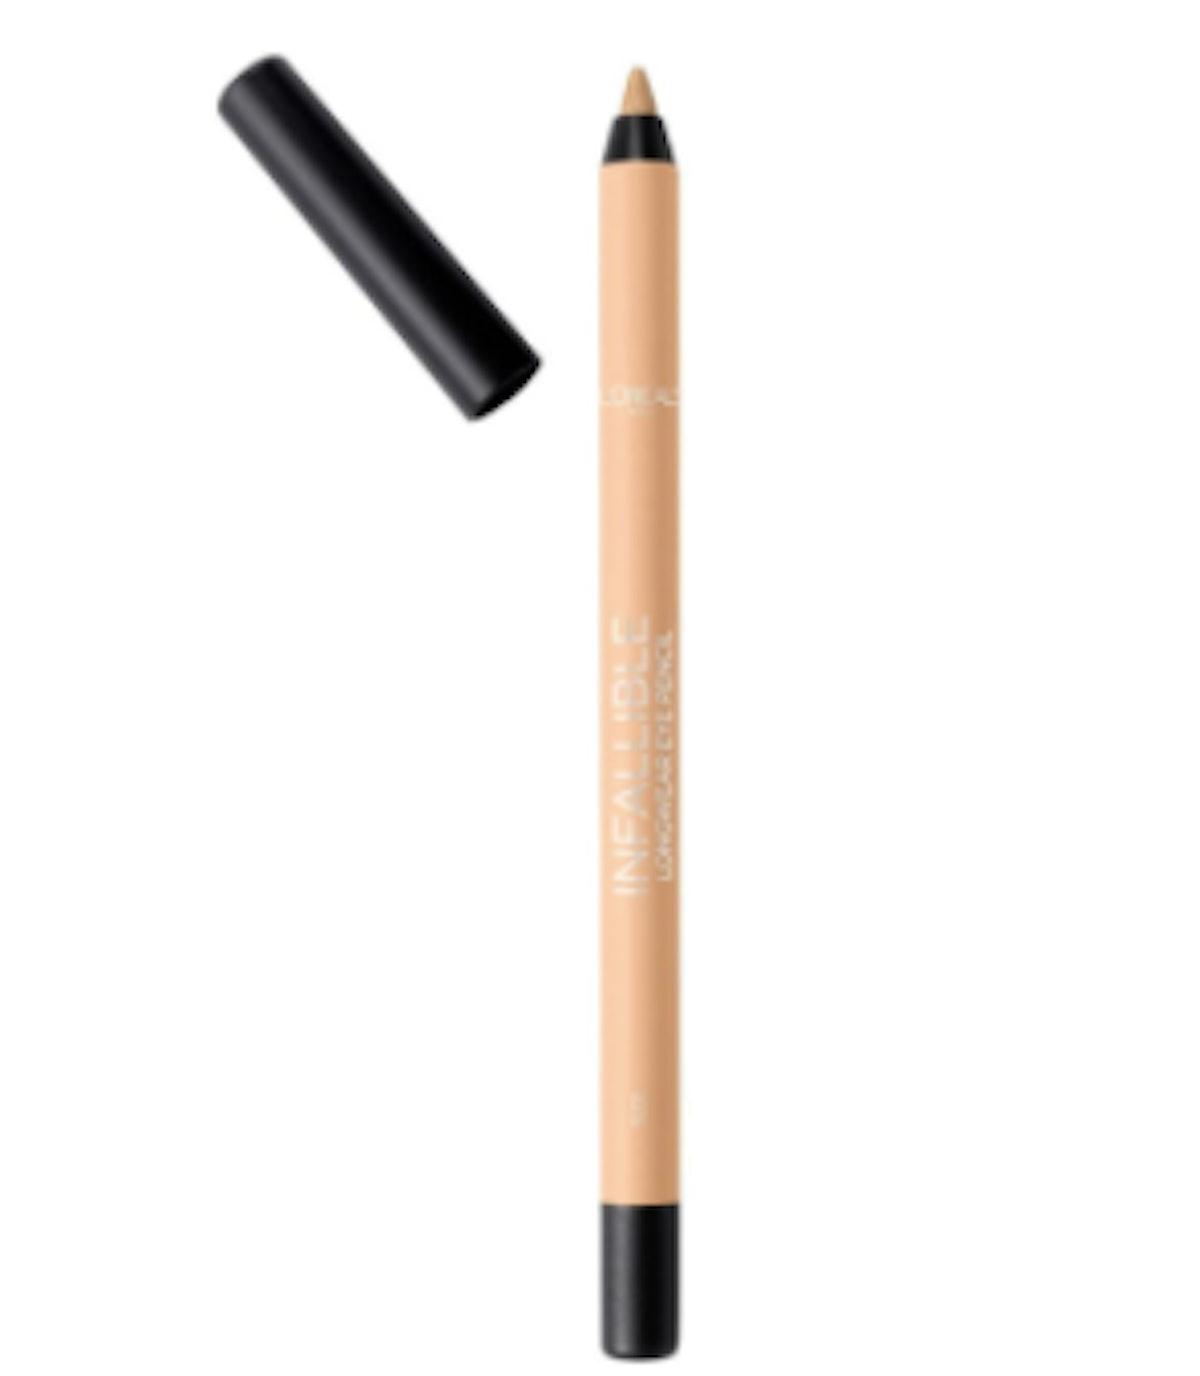 L'Oreal Infallible Pro-Last Waterproof Pencil Eyeliner in Nude